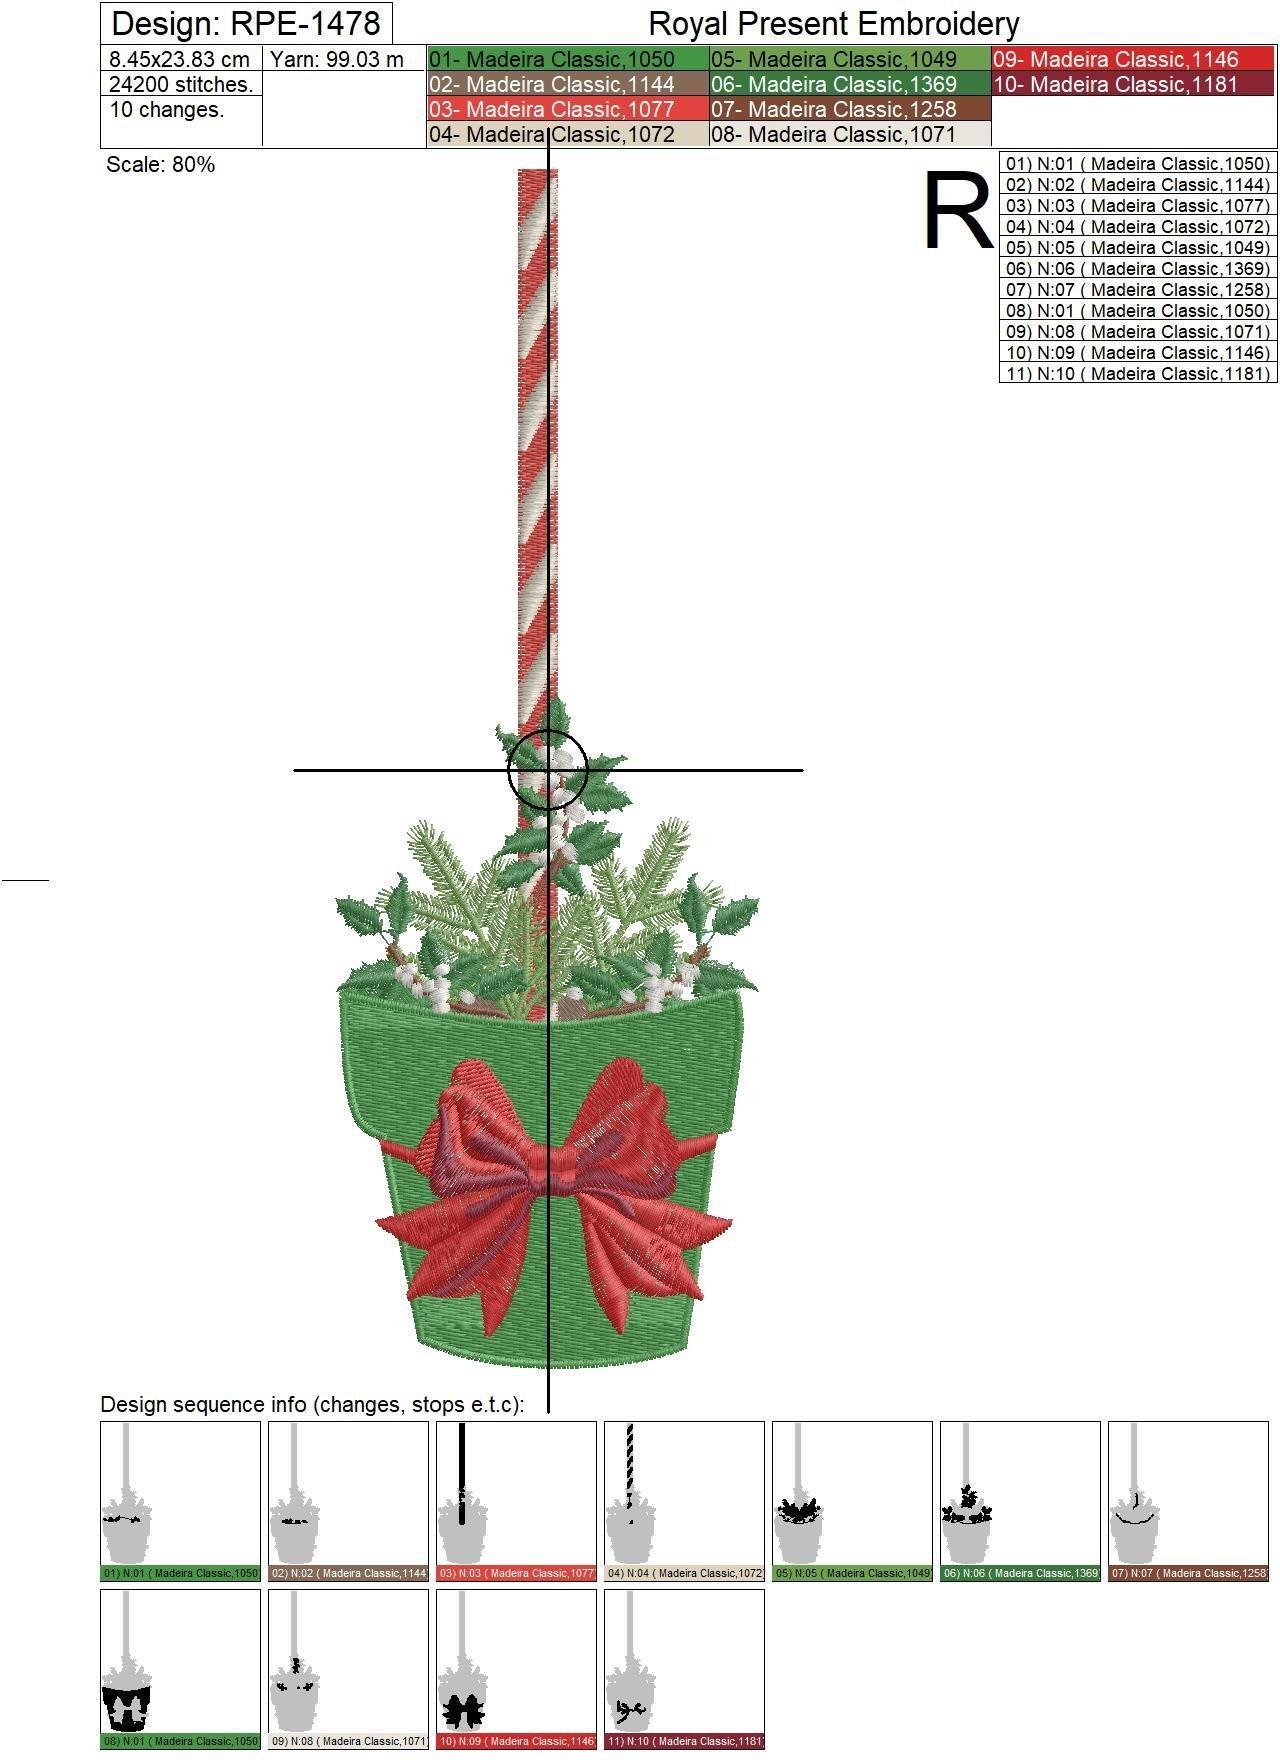 Christmas tree wall art machine embroidery design - 2 sizes